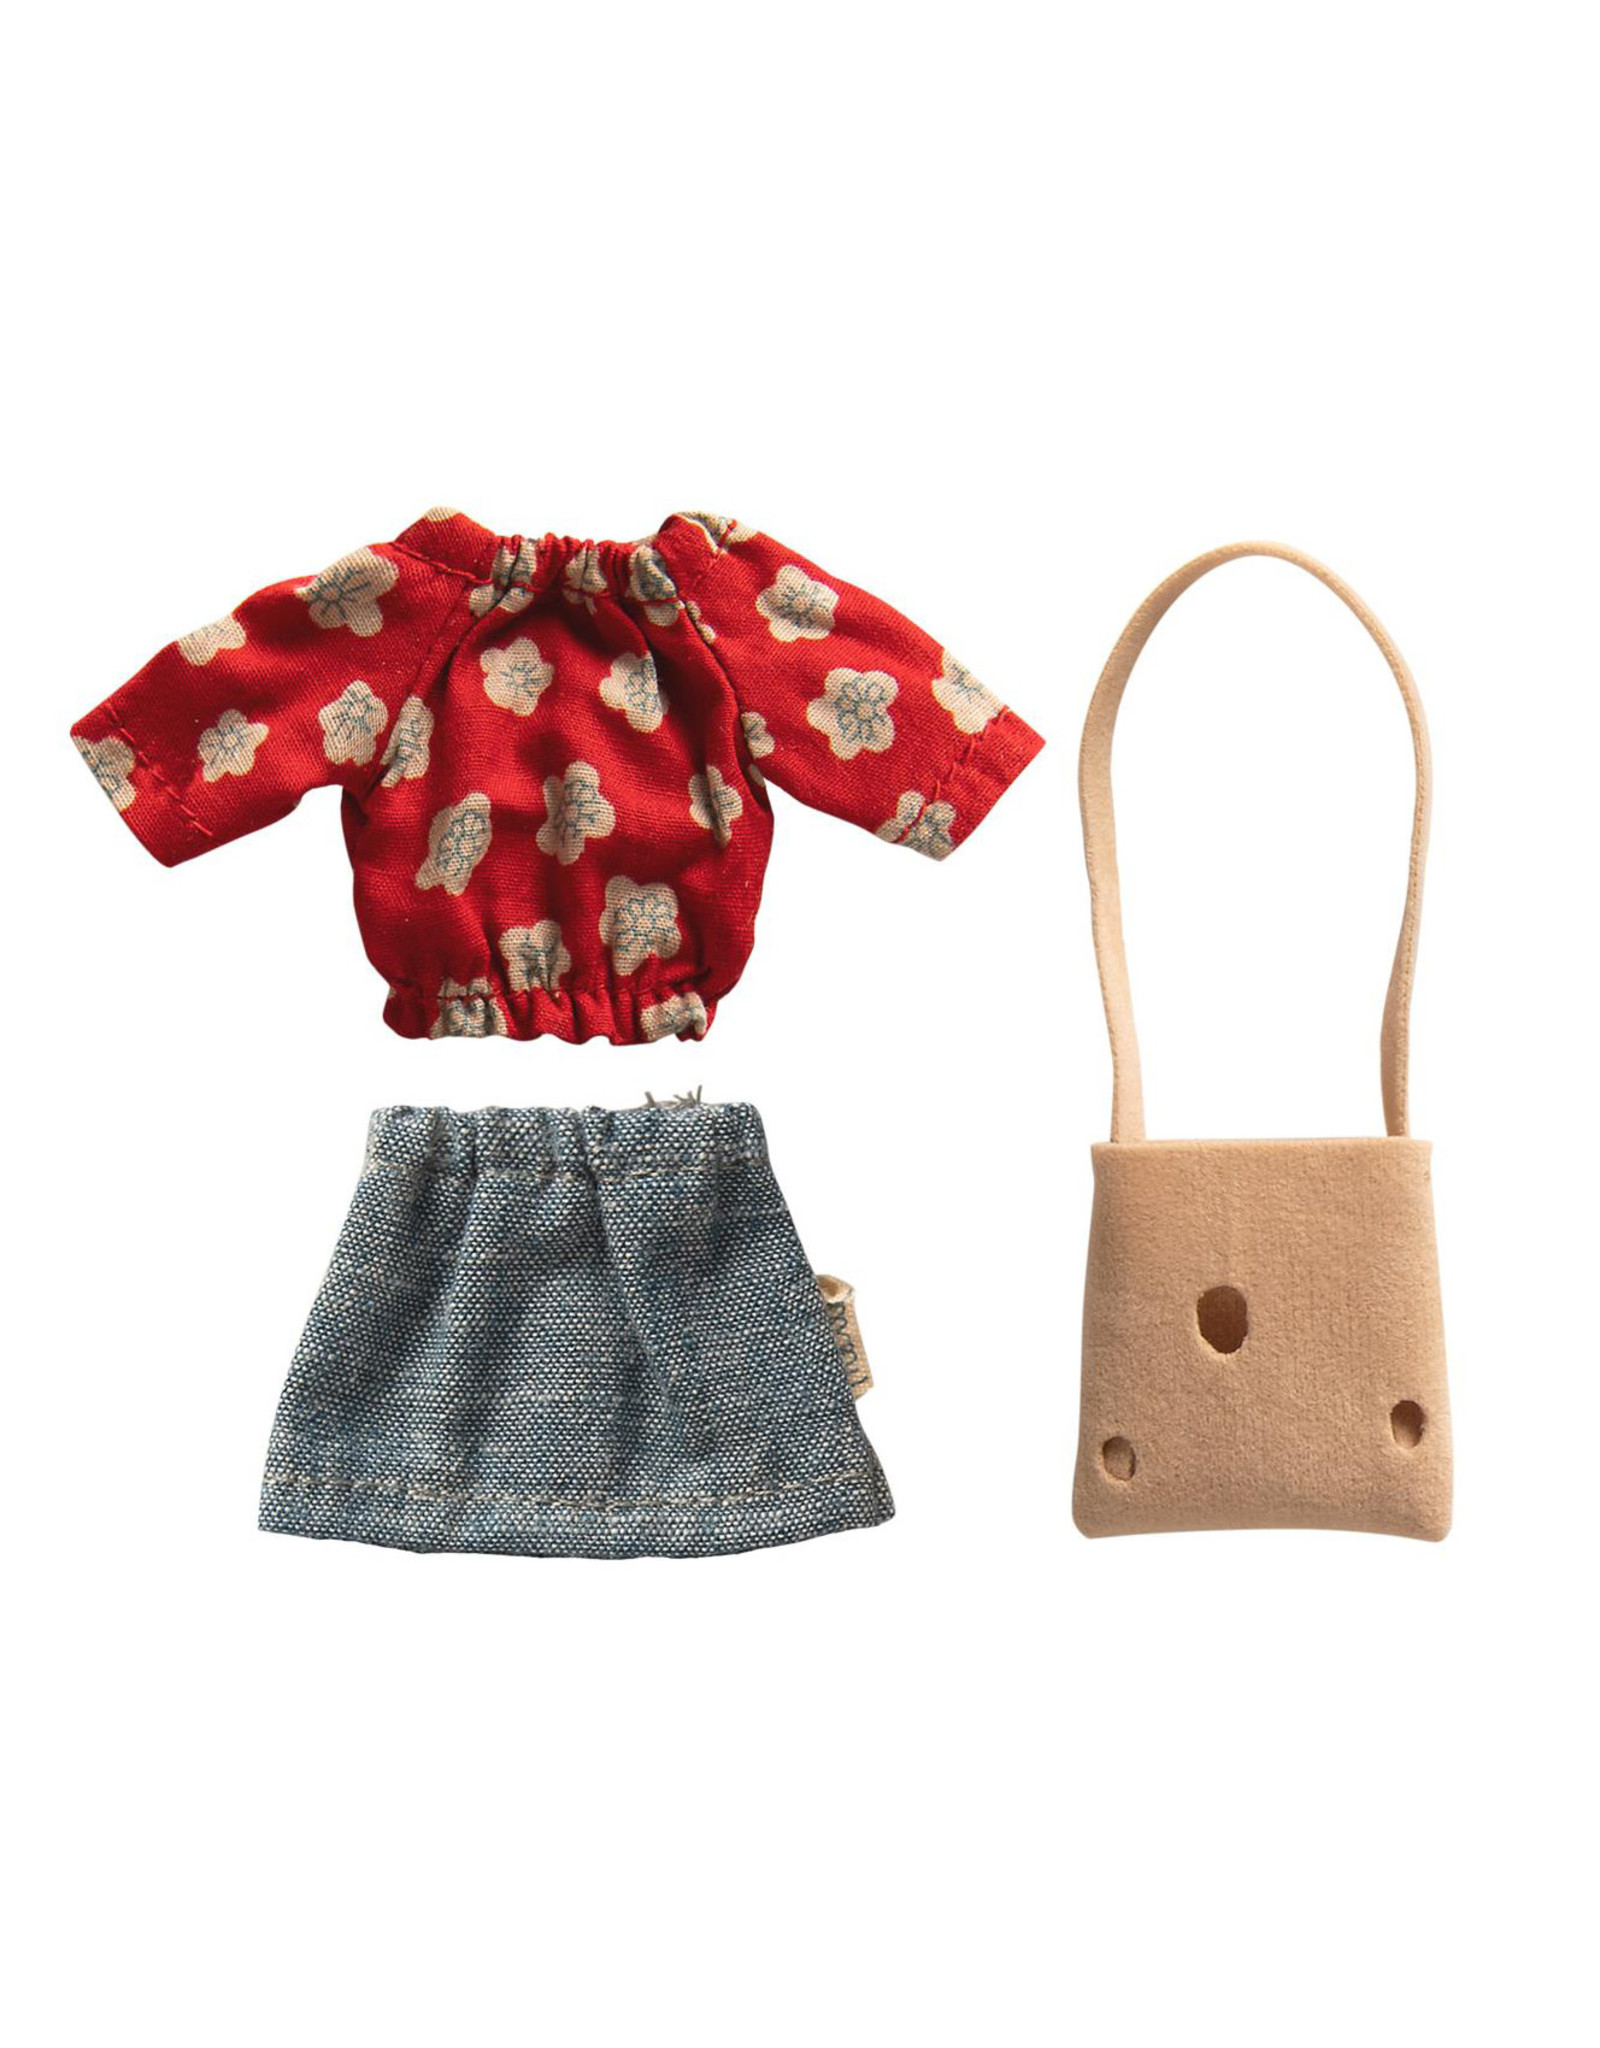 Maileg Mum Mouse - Red Floral Top + Denim Skirt